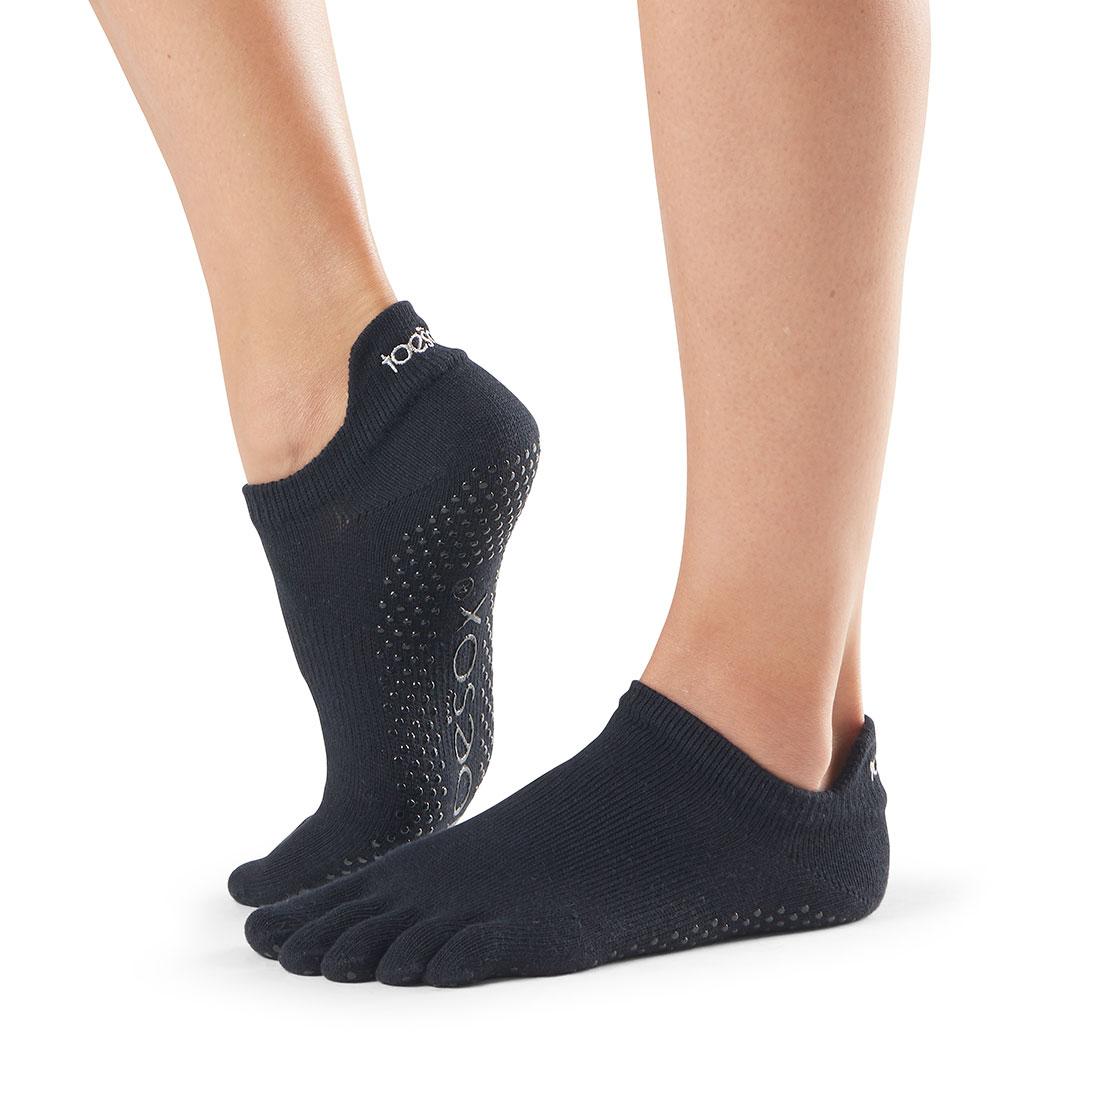 Yogasocken ToeSox Low Rise Full Toe Black - 1